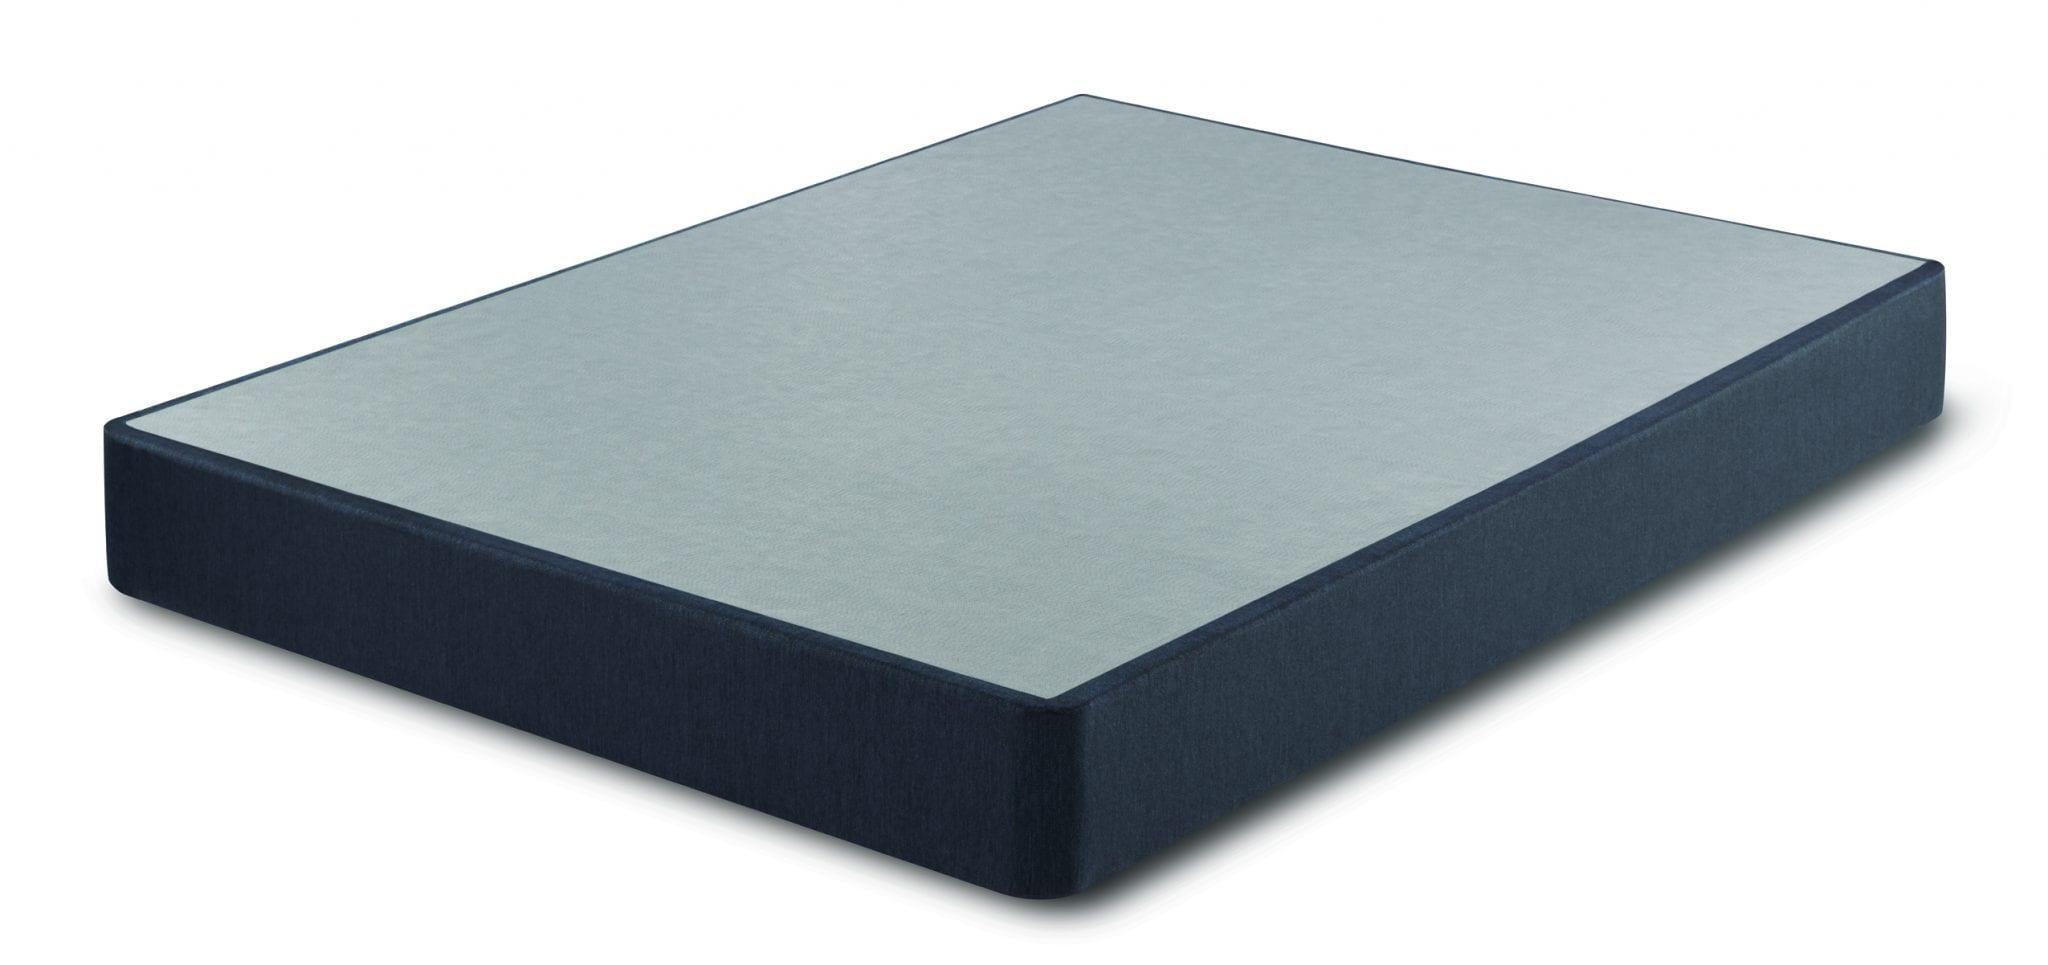 Serta iComfort Flat Foundation